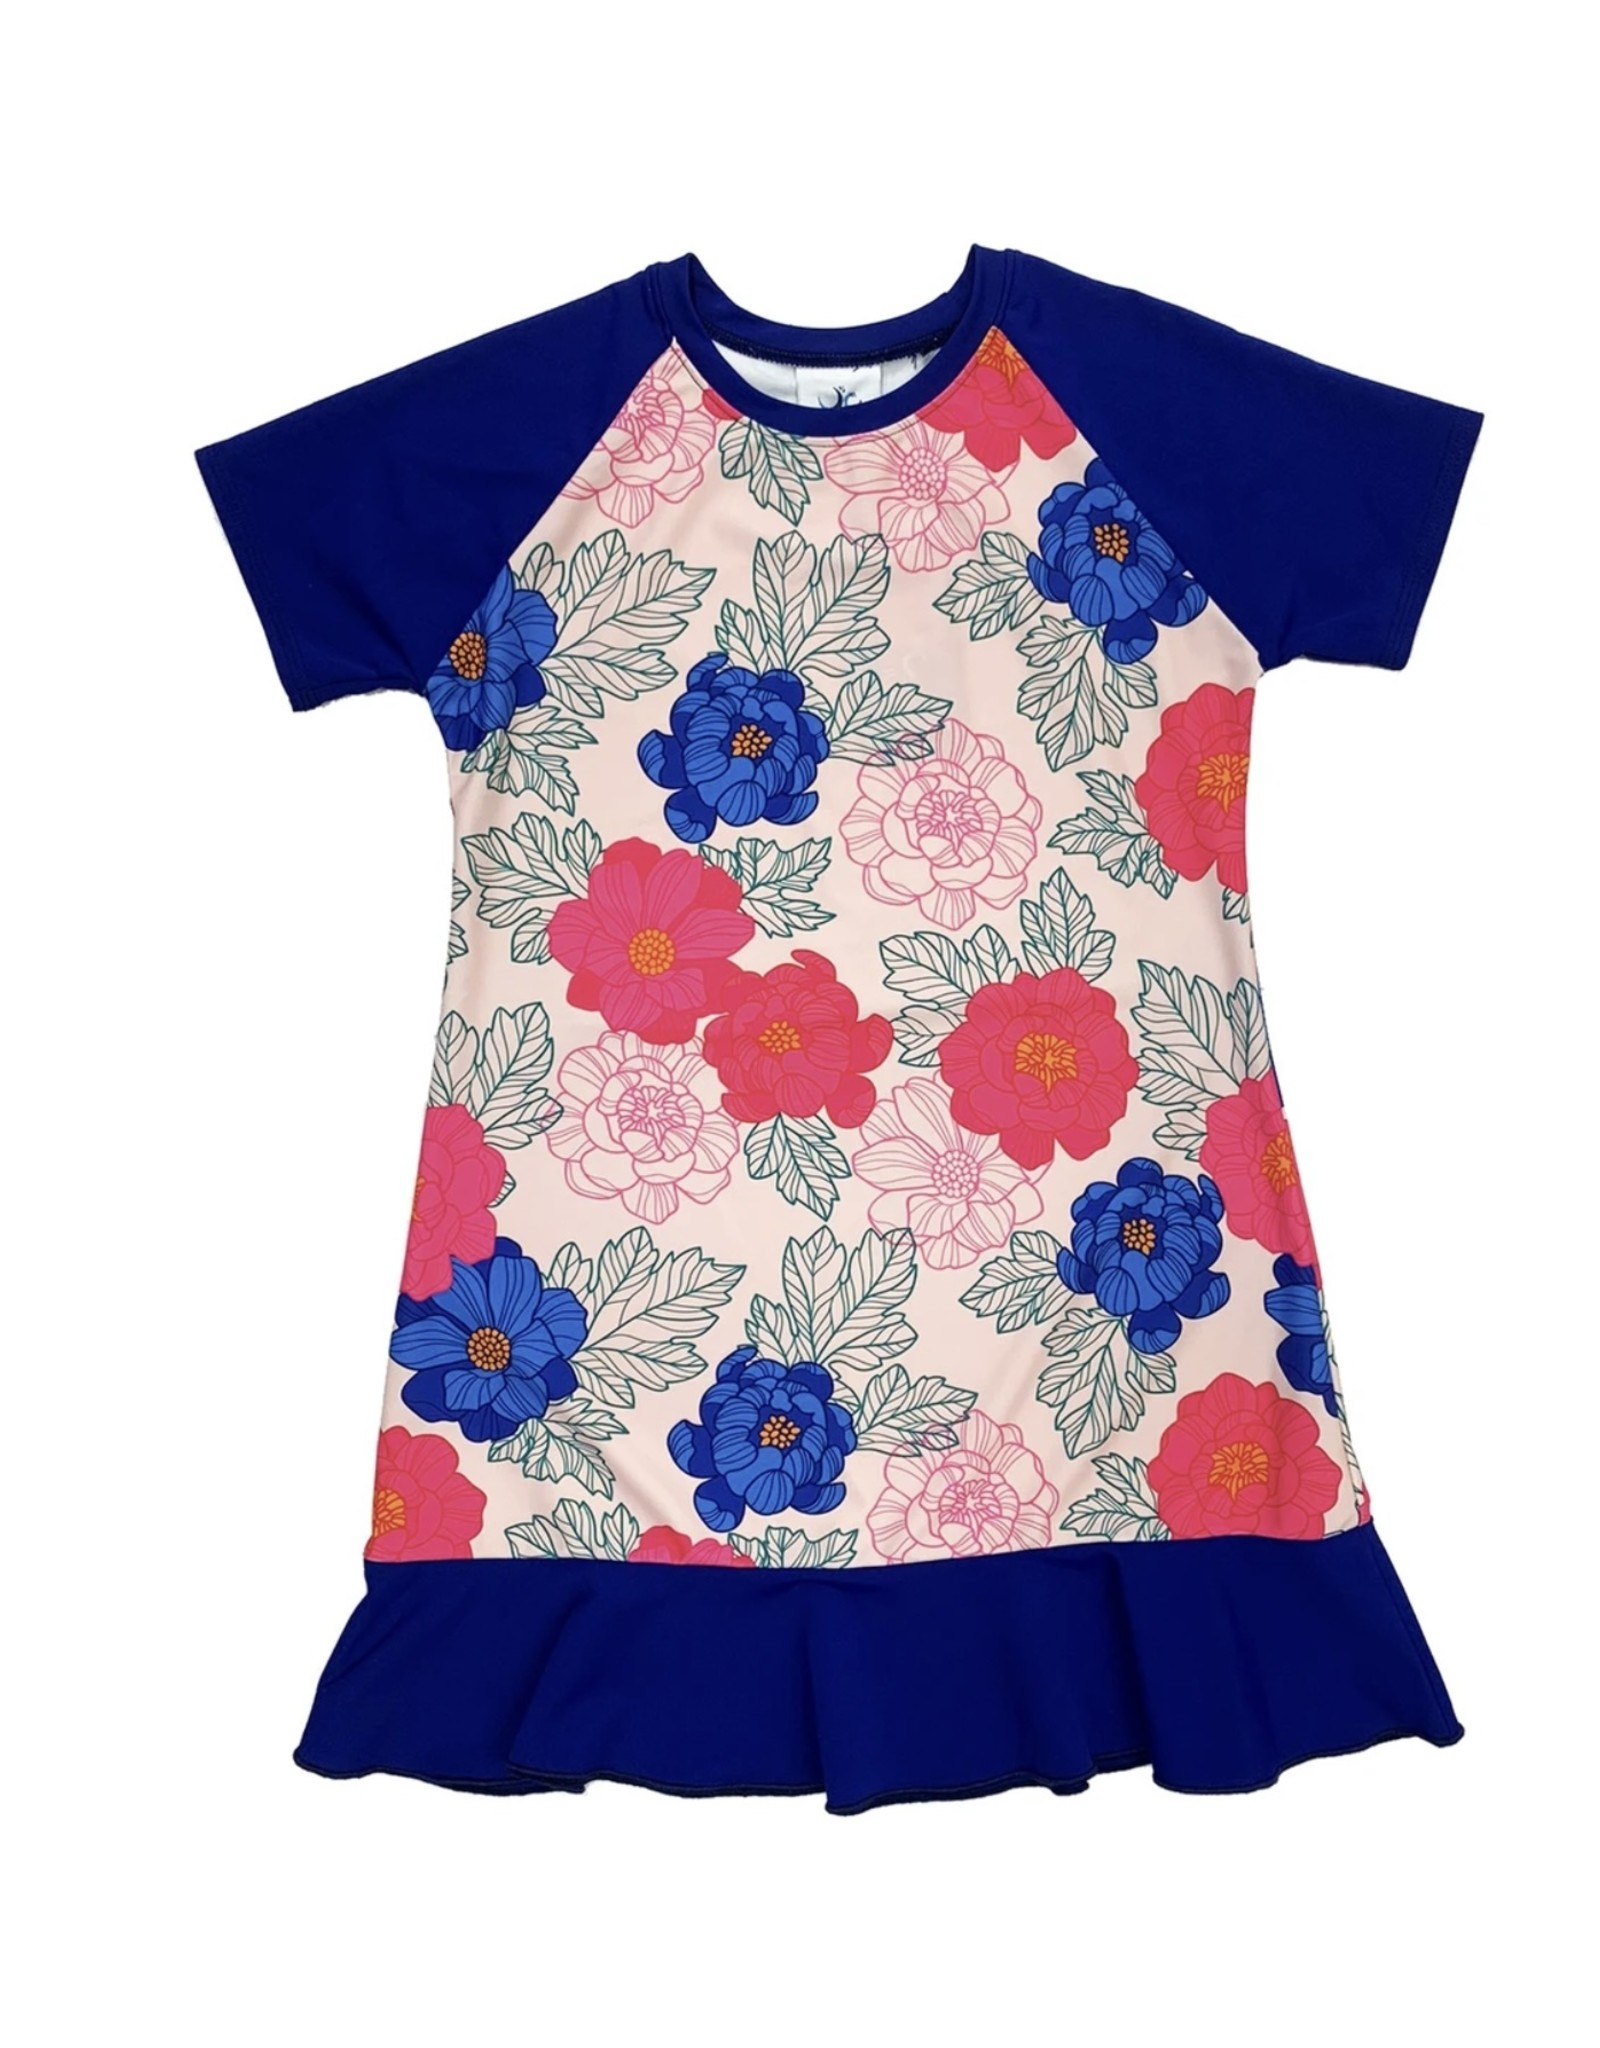 Undercover Waterwear Undercover Waterwear Kids Floral Mini Me Swim Dress